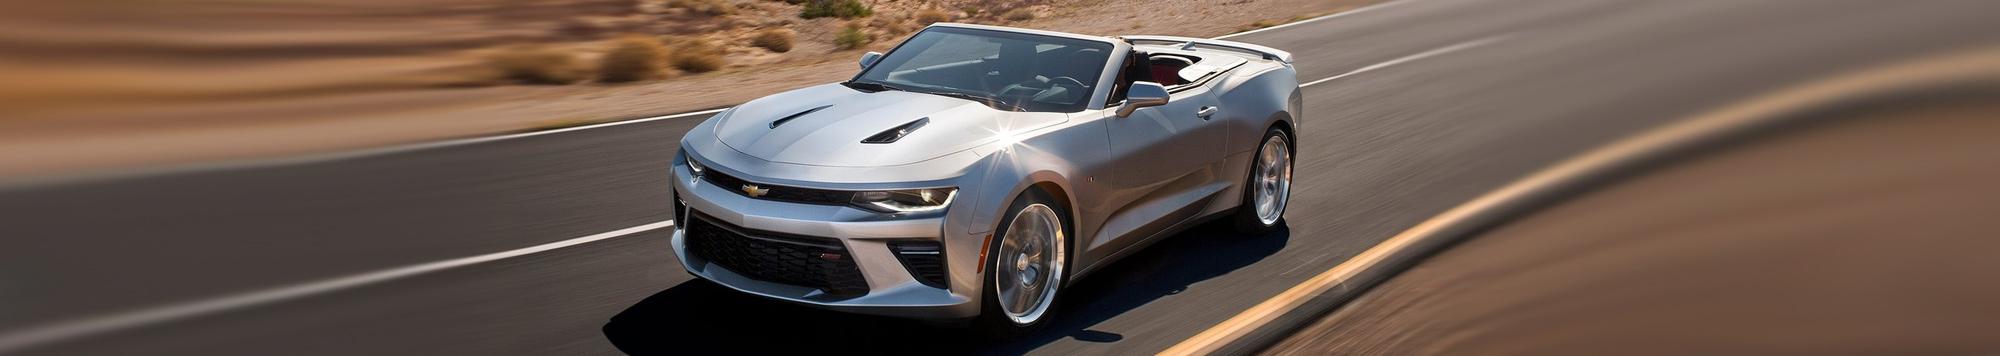 Anamaks Motors LLC - Used Cars - Hudson NH Dealer